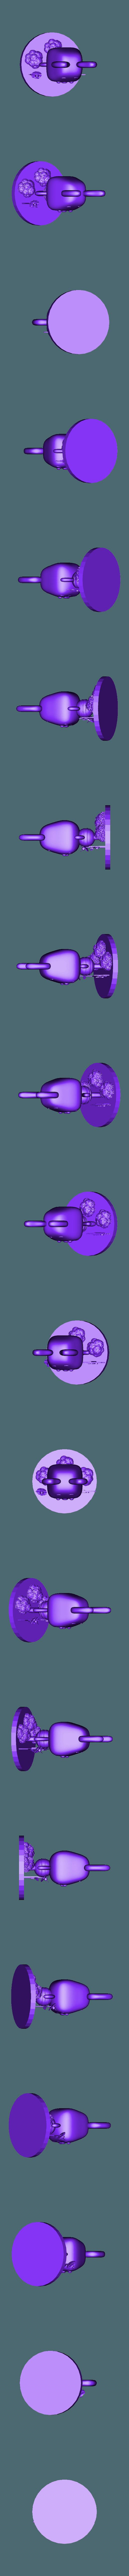 PIGLET COMPLETO.stl Download free STL file PIGLET - winnie pooh, tender, gentle • 3D print object, RMMAKER